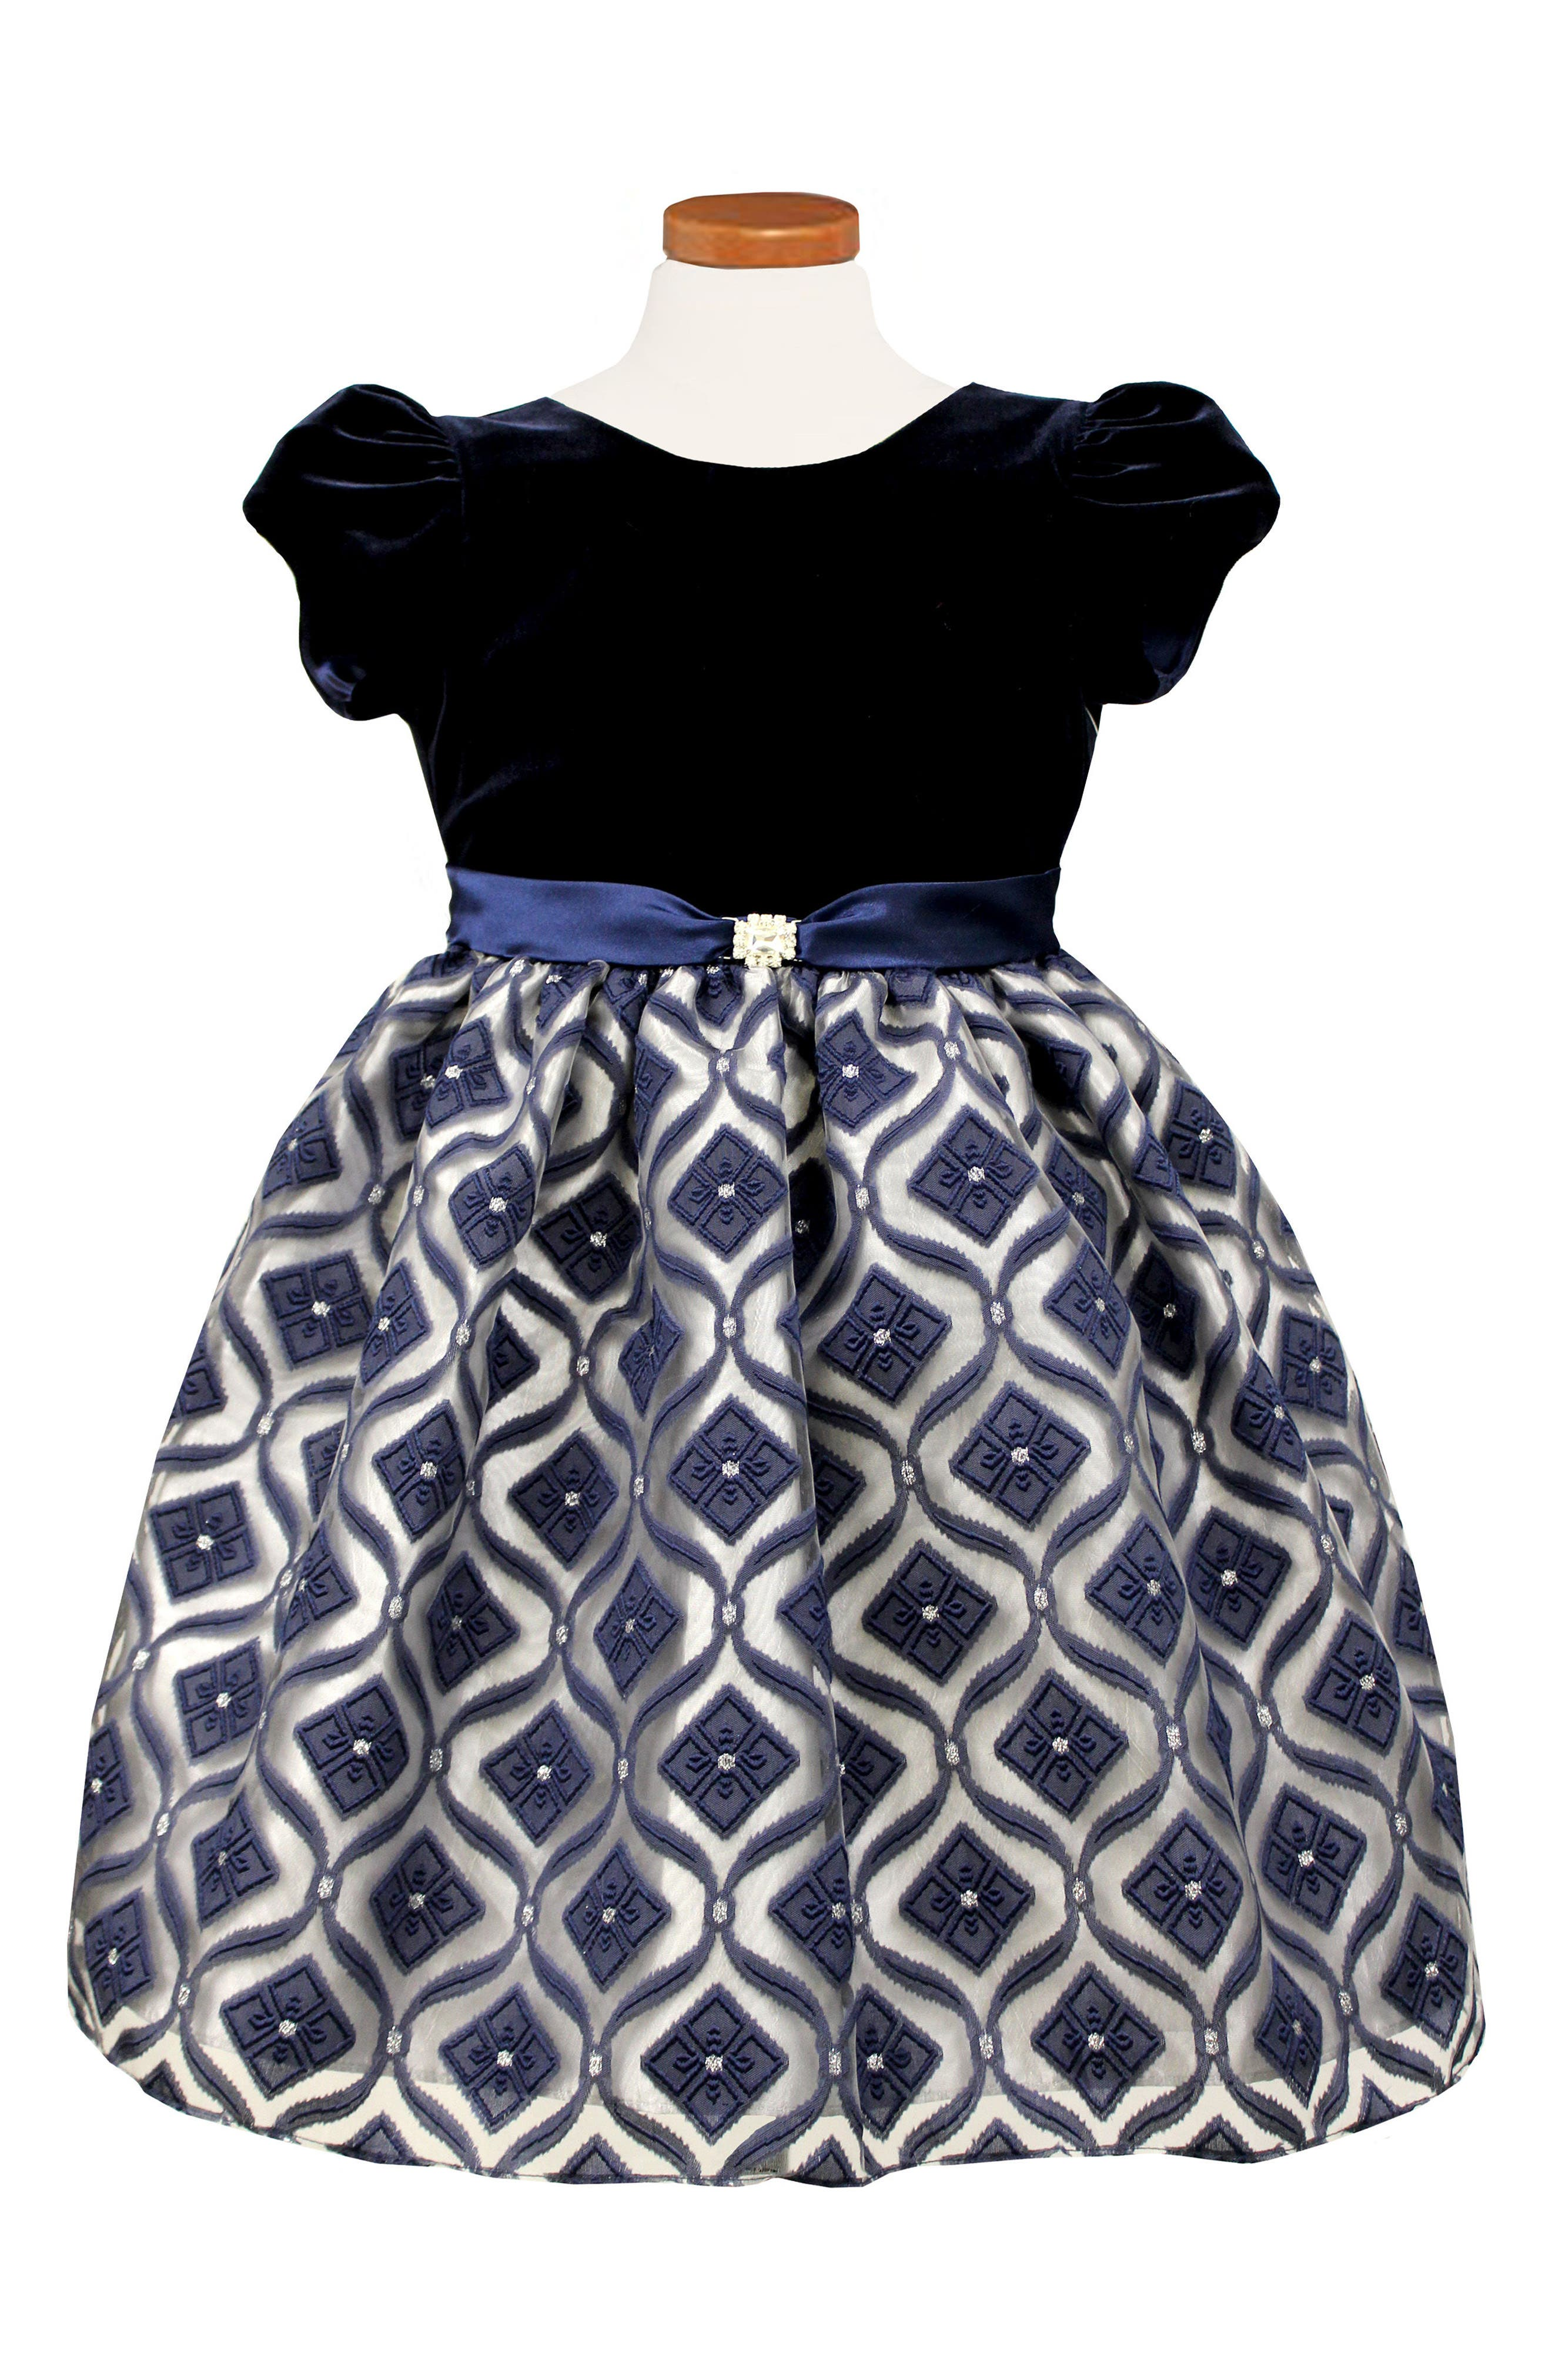 Main Image - Sorbet Diamond Burnout Dress (Toddler Girls & Little Girls)